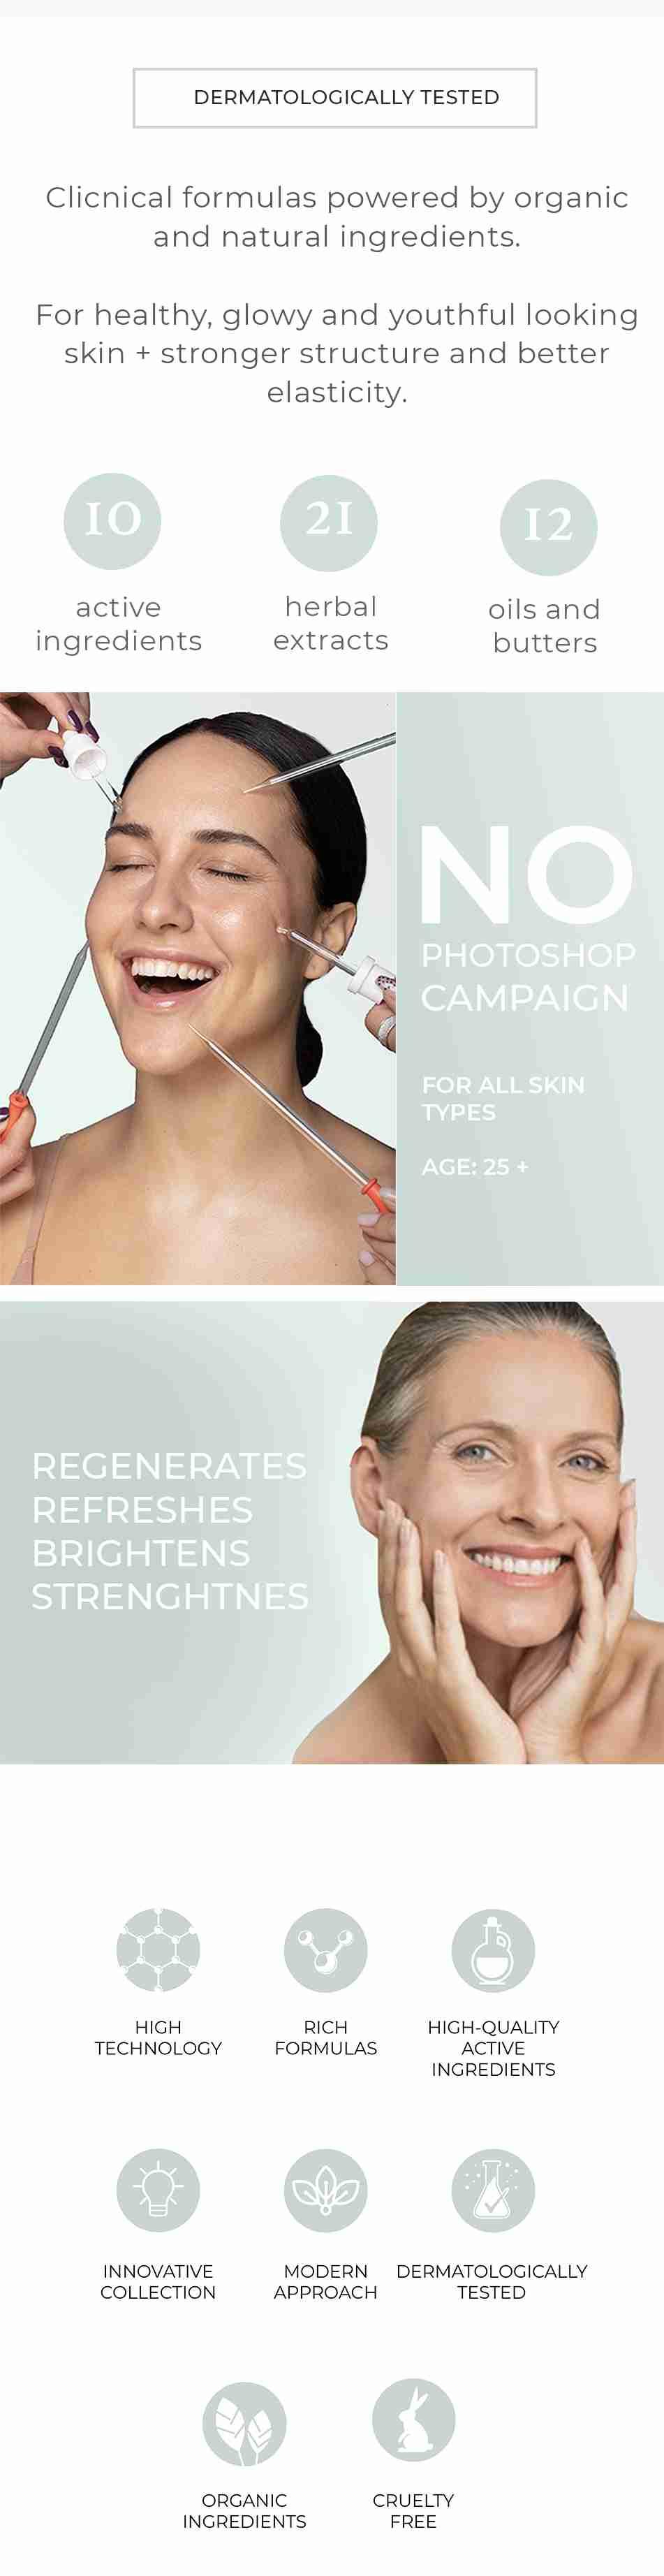 Dermatologically Tested La PIEL Lab natural Skincare Face Collection Lana Jurcevic